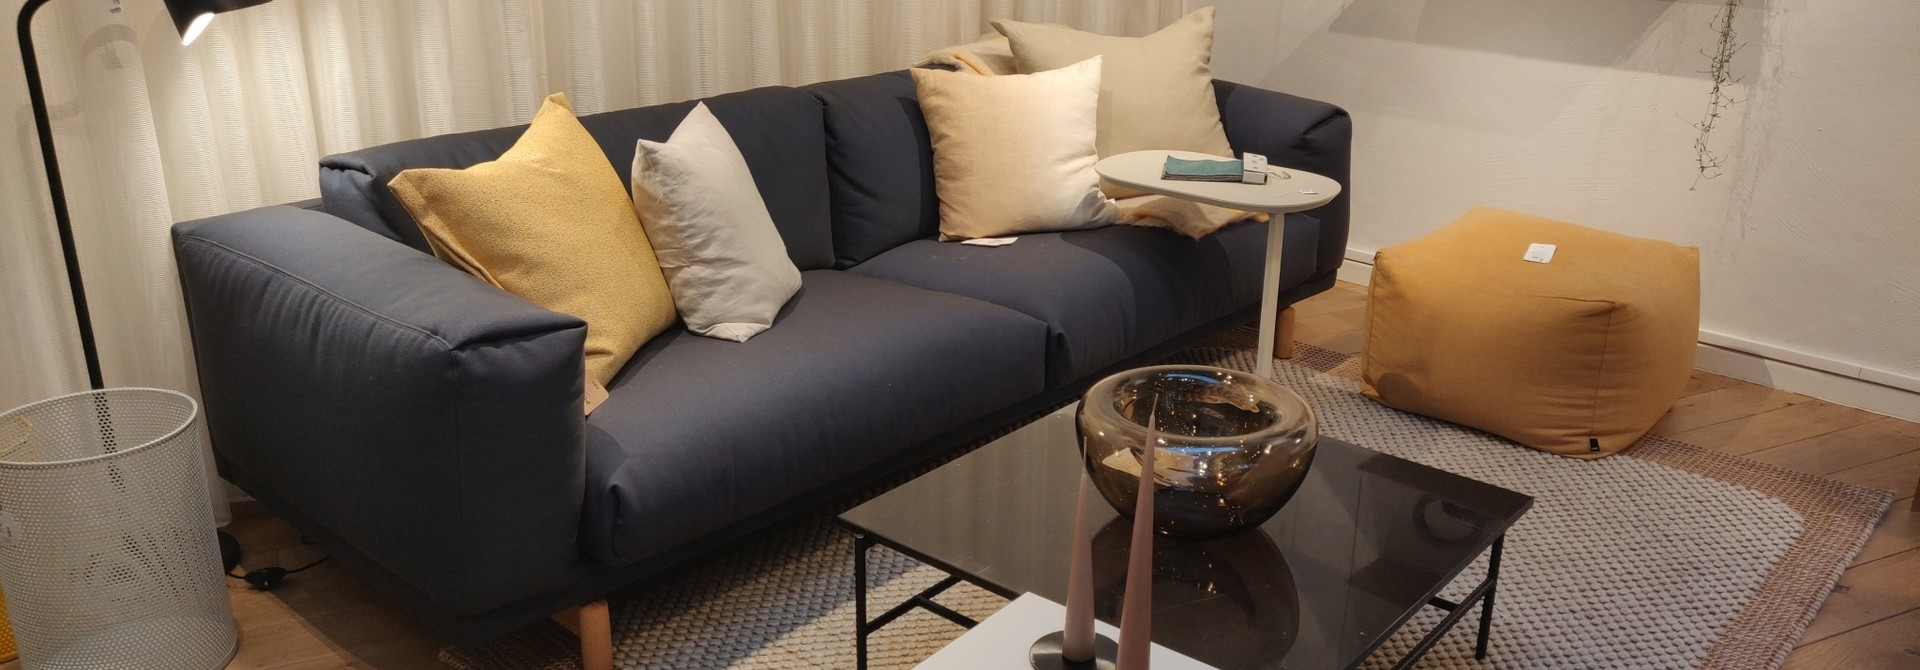 Toonzaalmodel Rest sofa - 3-seater - Steelcut trio3 756